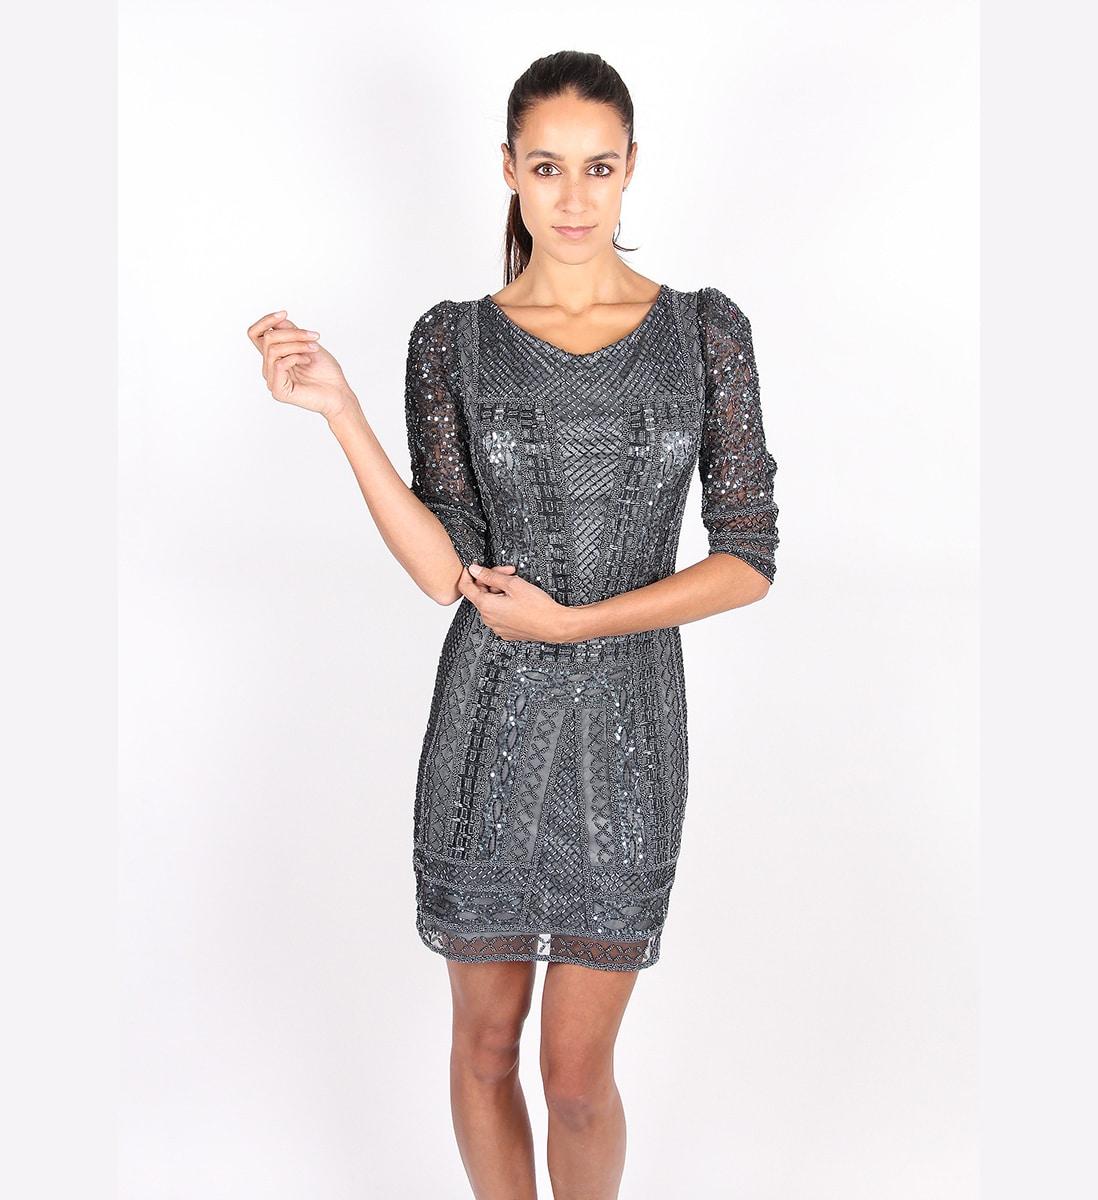 469cca3d791b Alila Charcoal Long Sleeve Sequin Dress by Scala